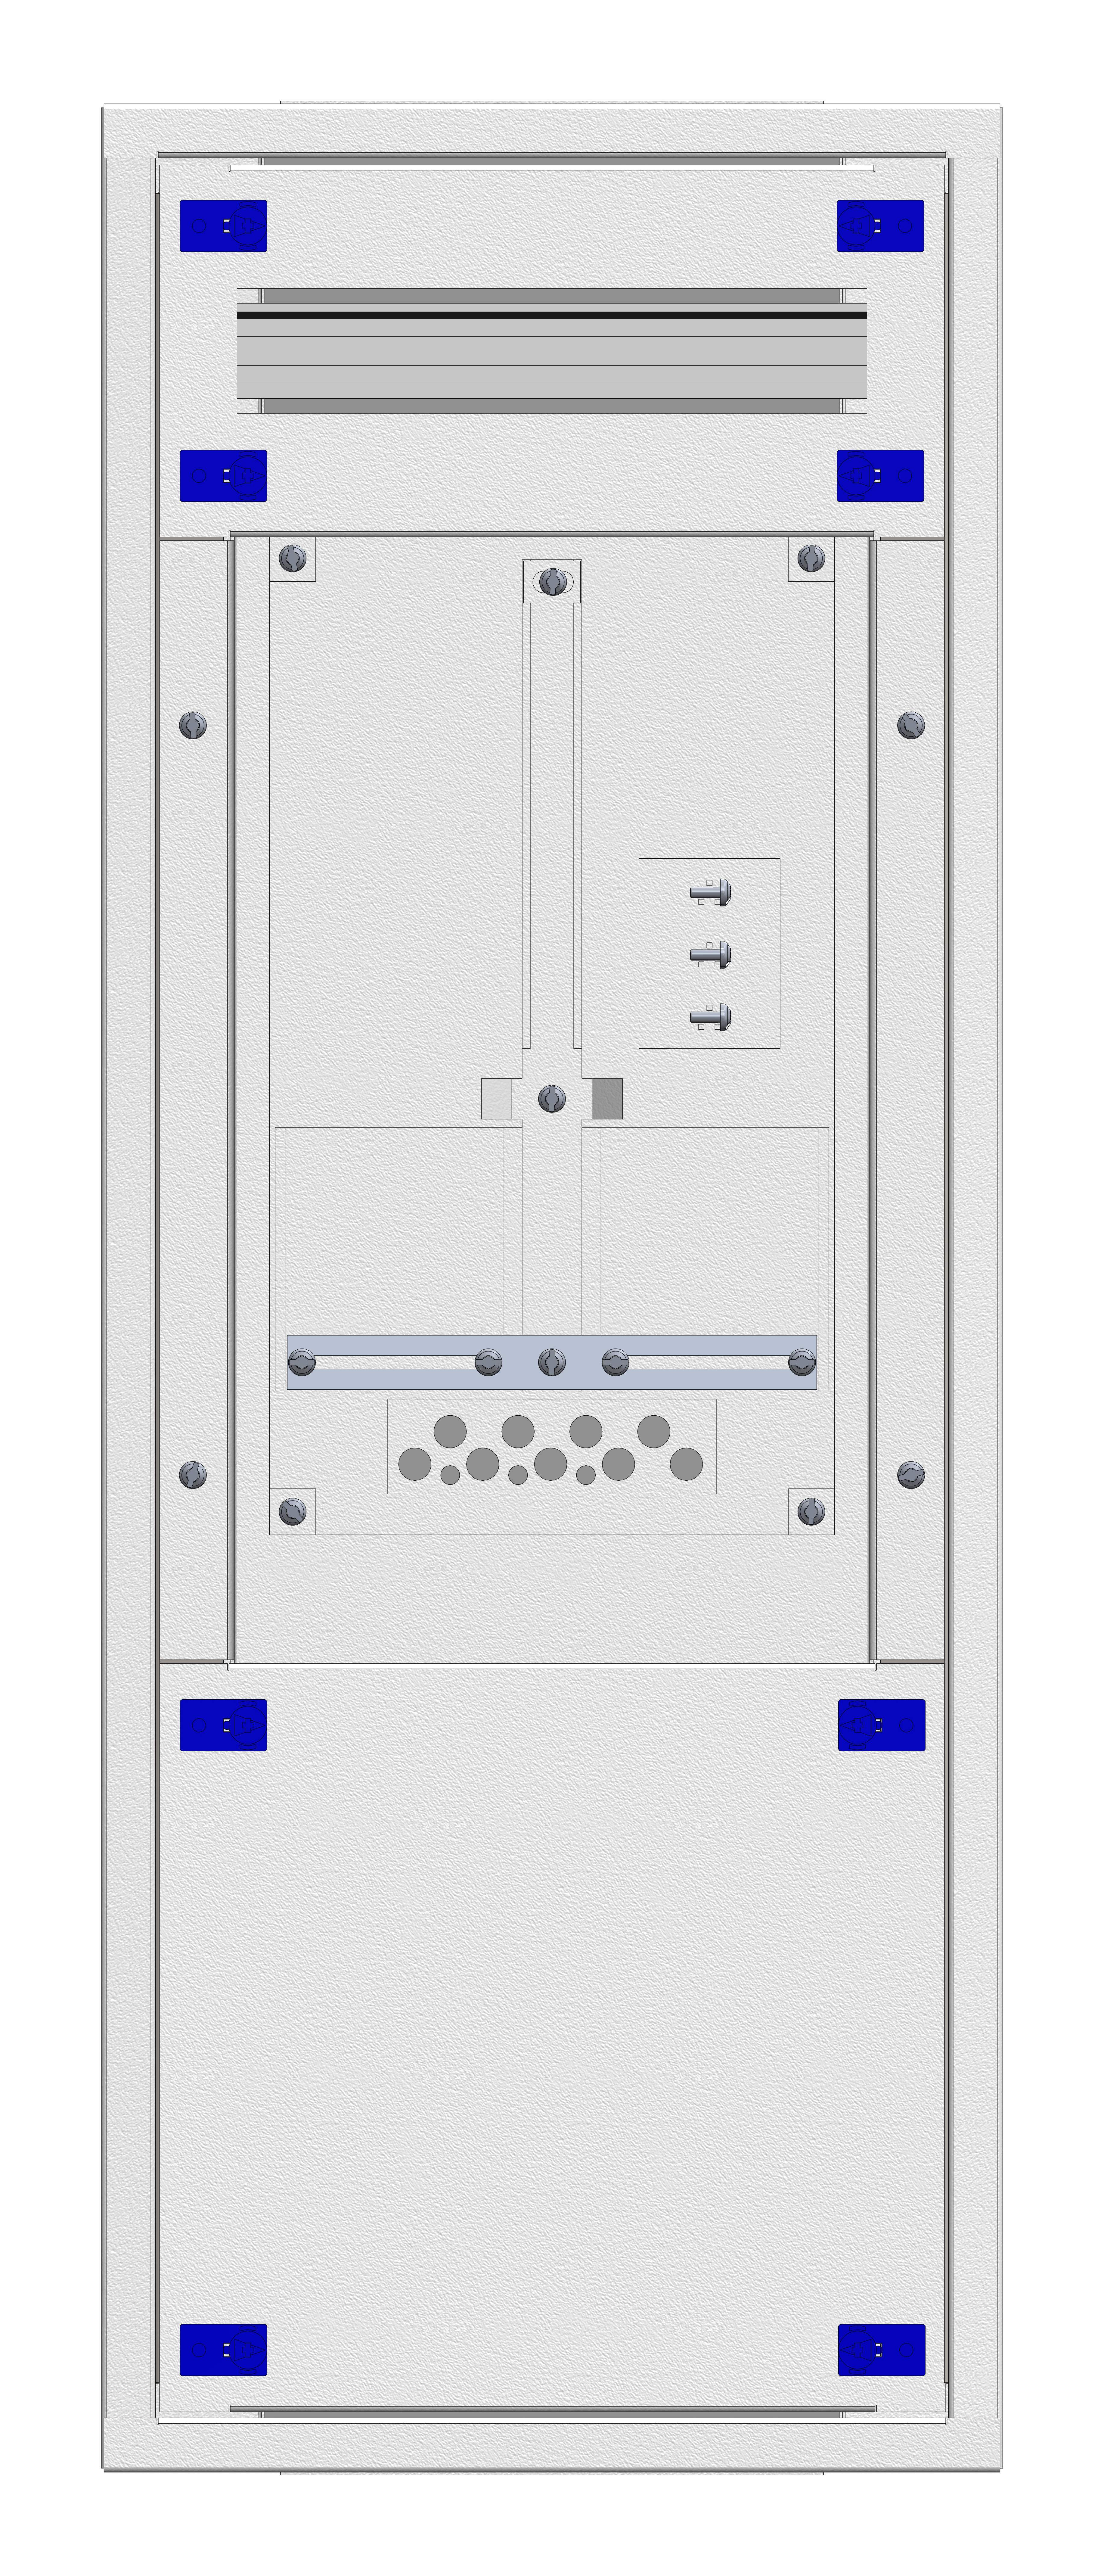 1 Stk Aufputz-Zählerverteiler 1A-18E/SBG 1ZP, H915B380T250mm IL160118SS